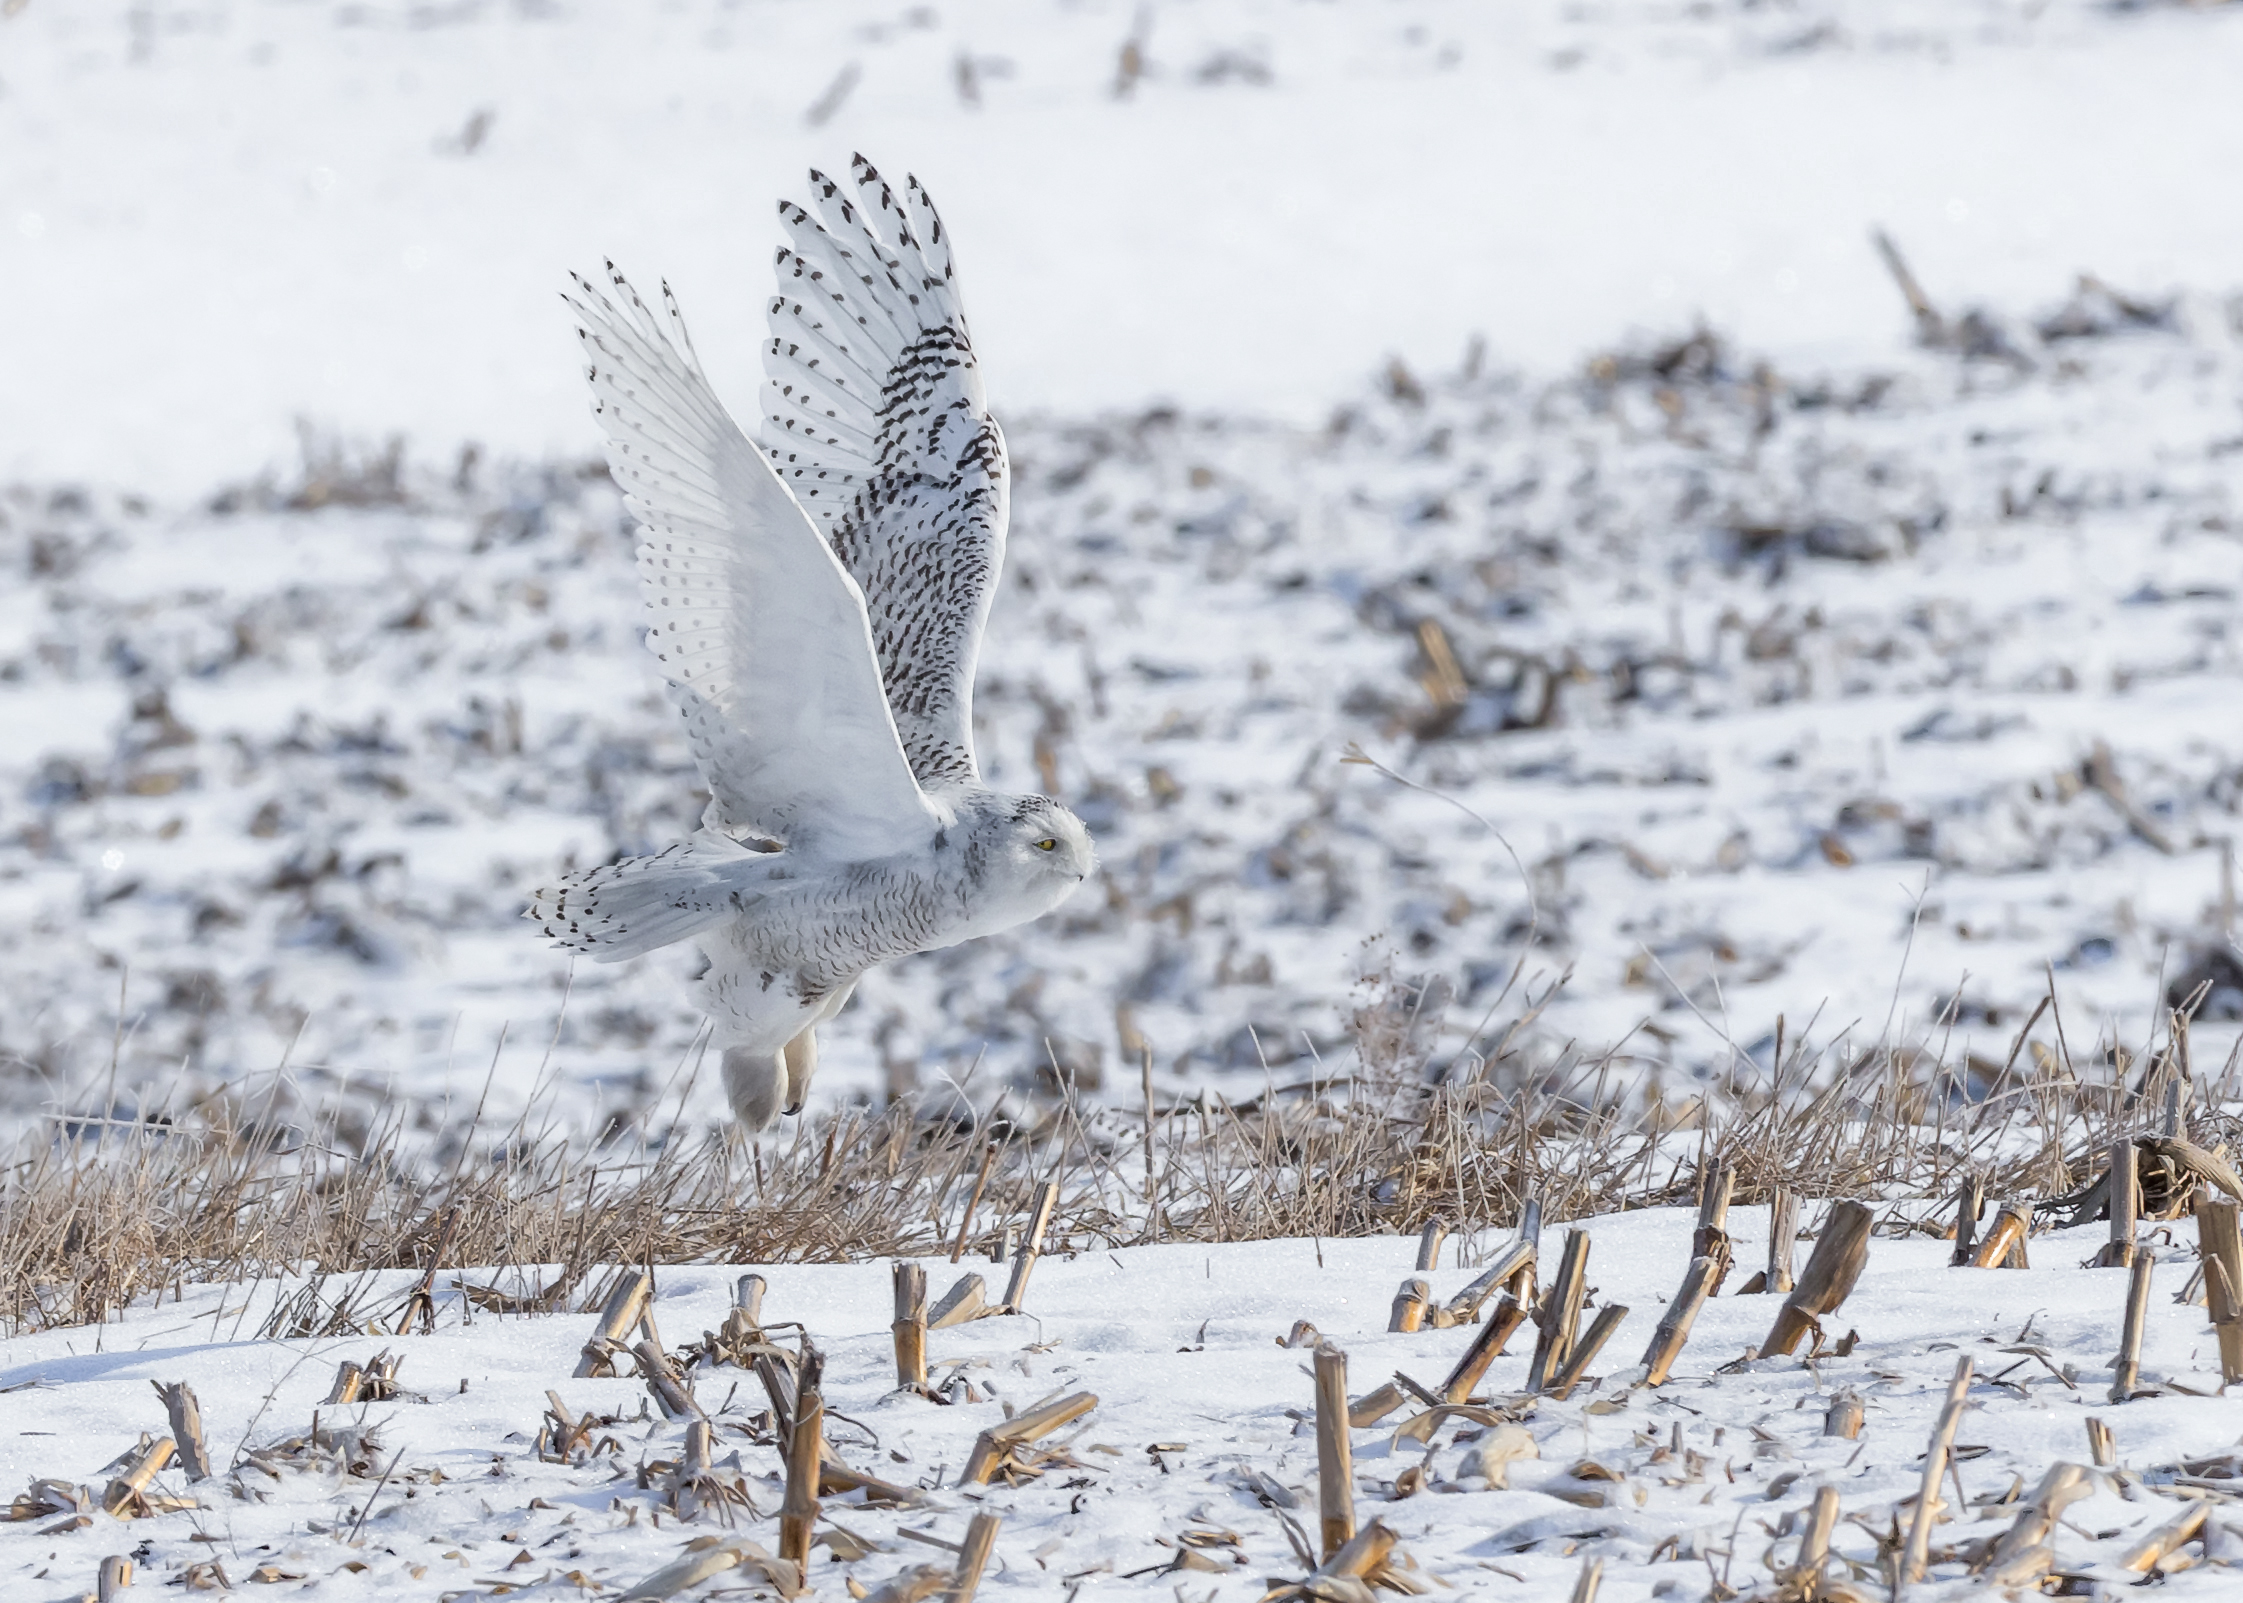 Snowy owl, photo by Monica Hall